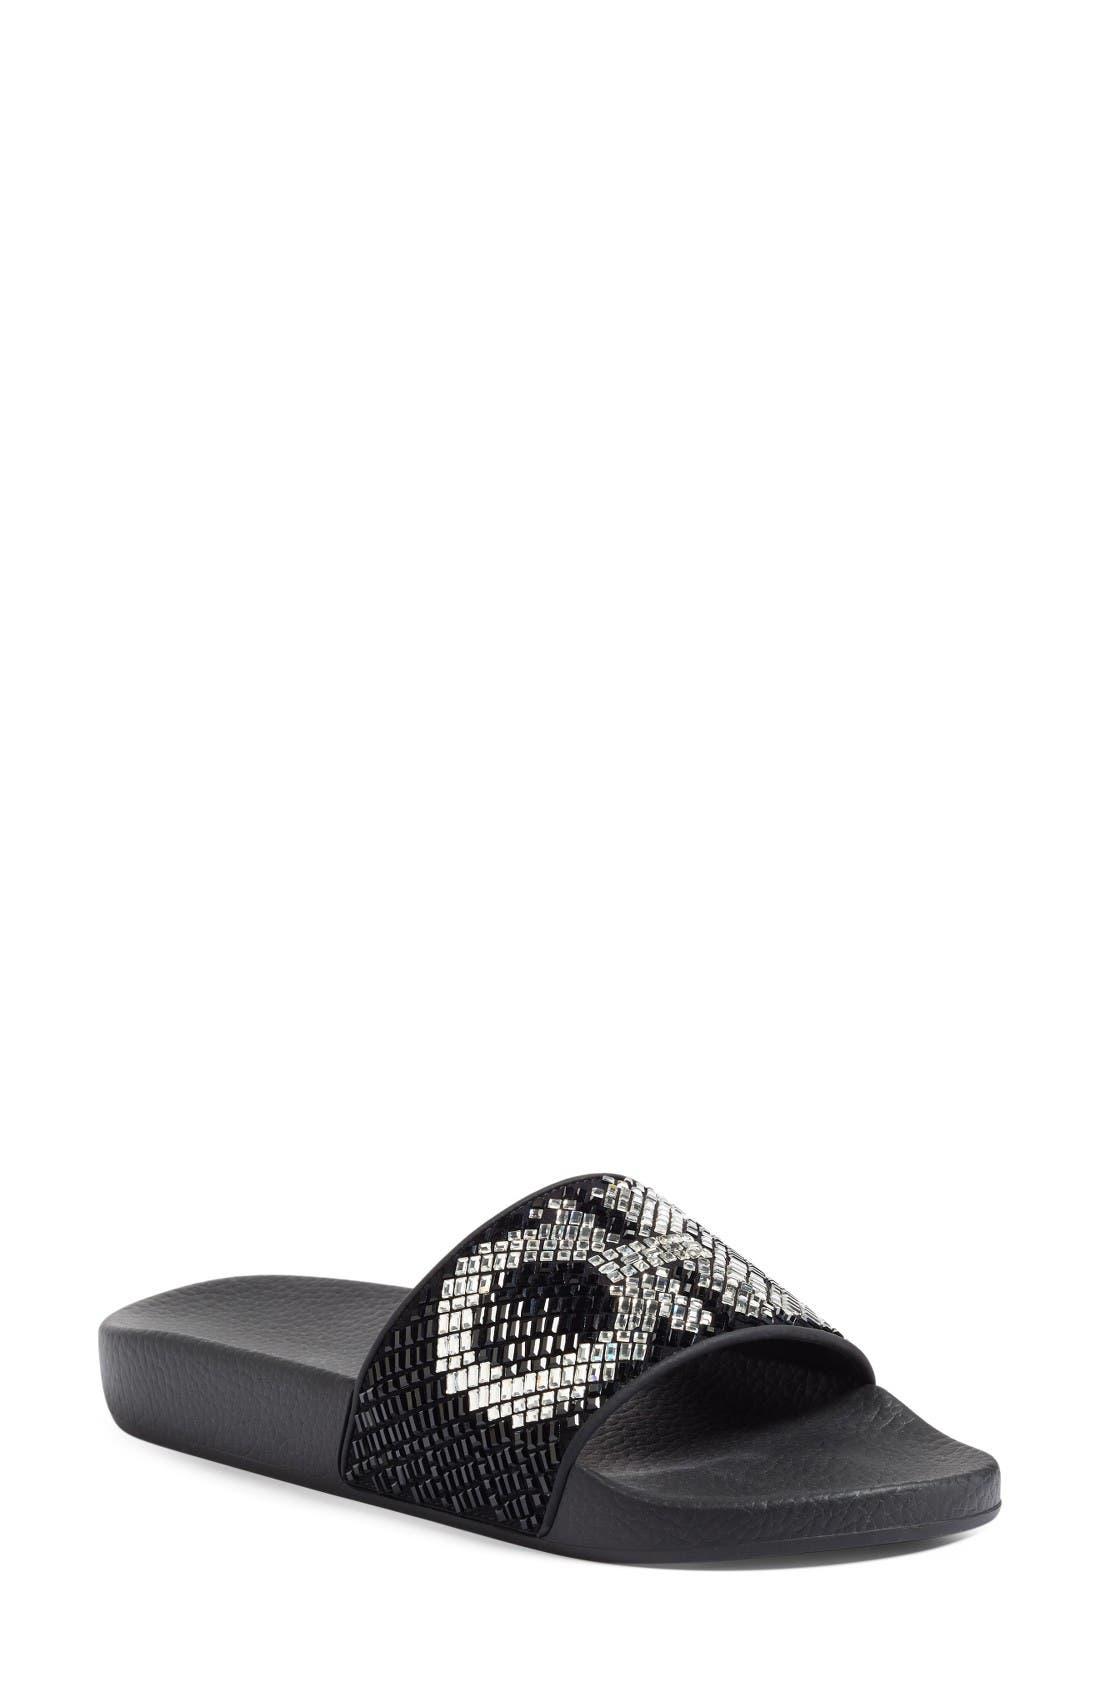 Alternate Image 1 Selected - Salvatore Ferragamo Crystal Logo Slide Sandal (Women)